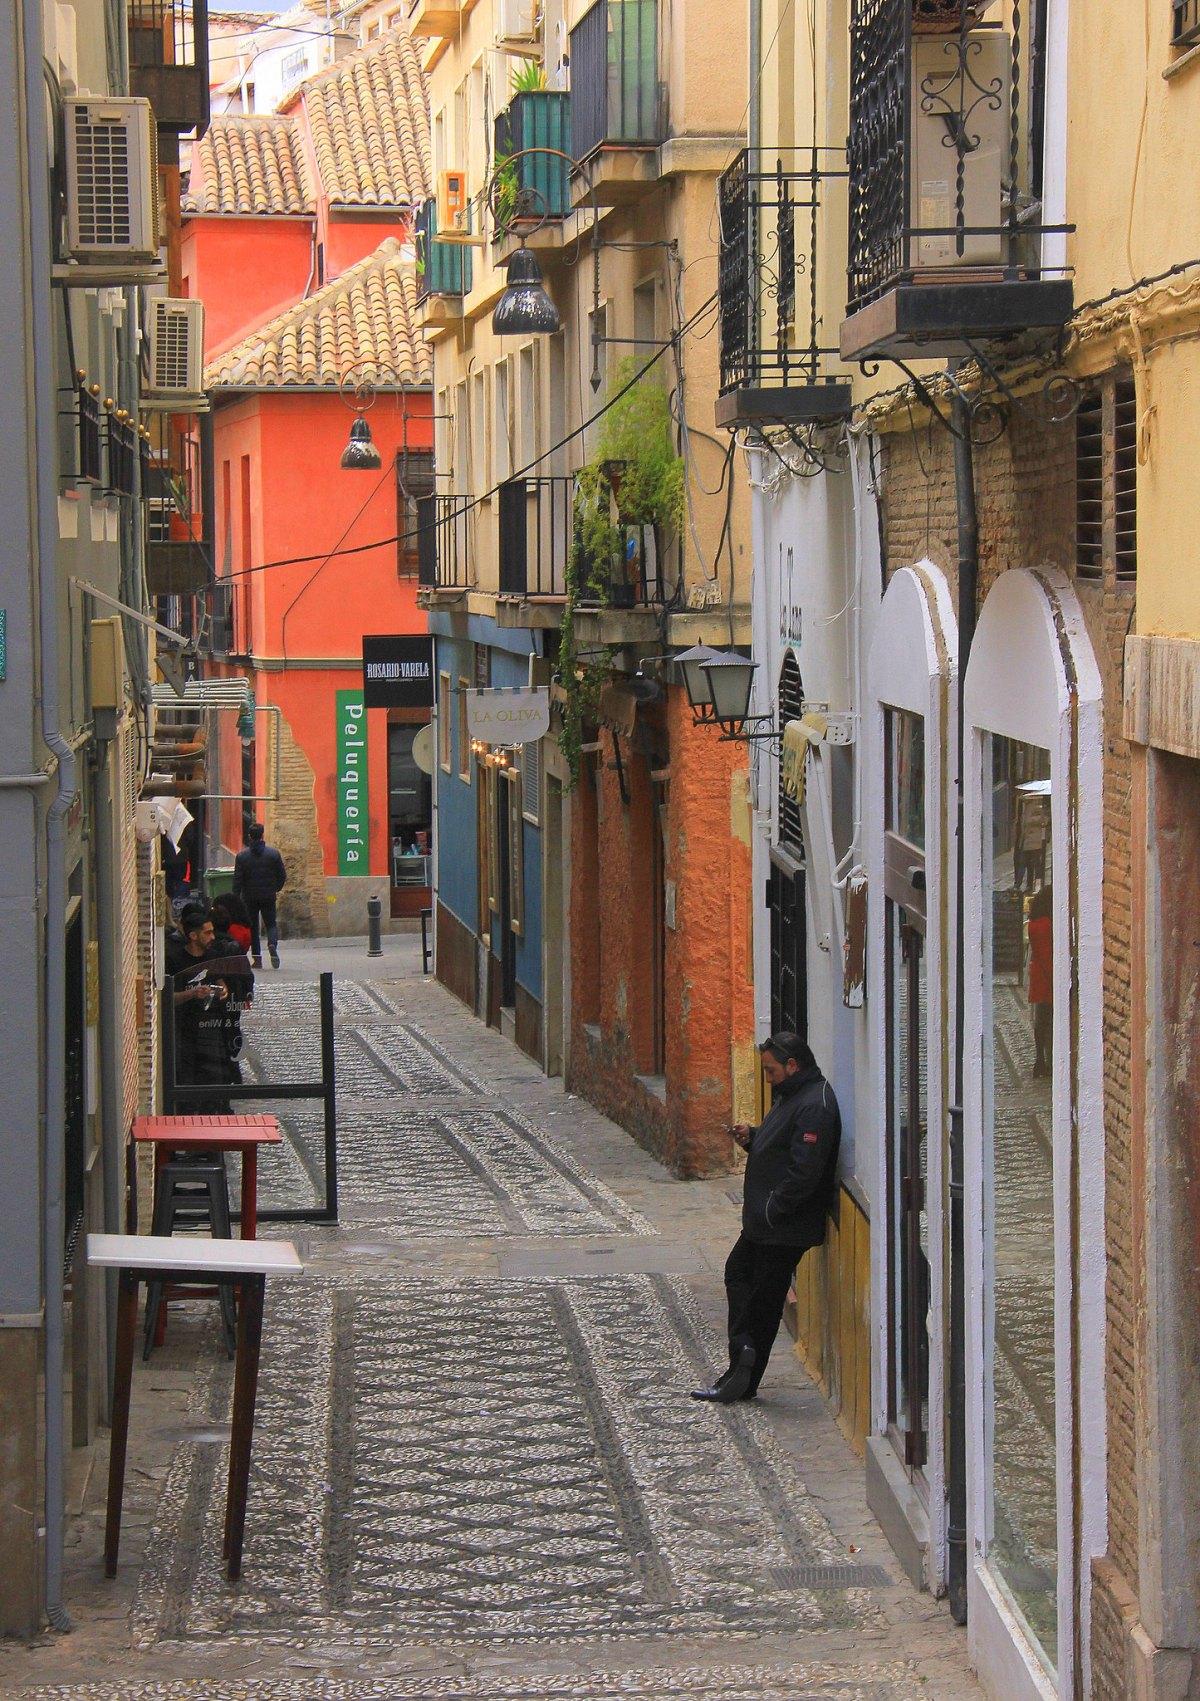 Granada in spain is beautiful